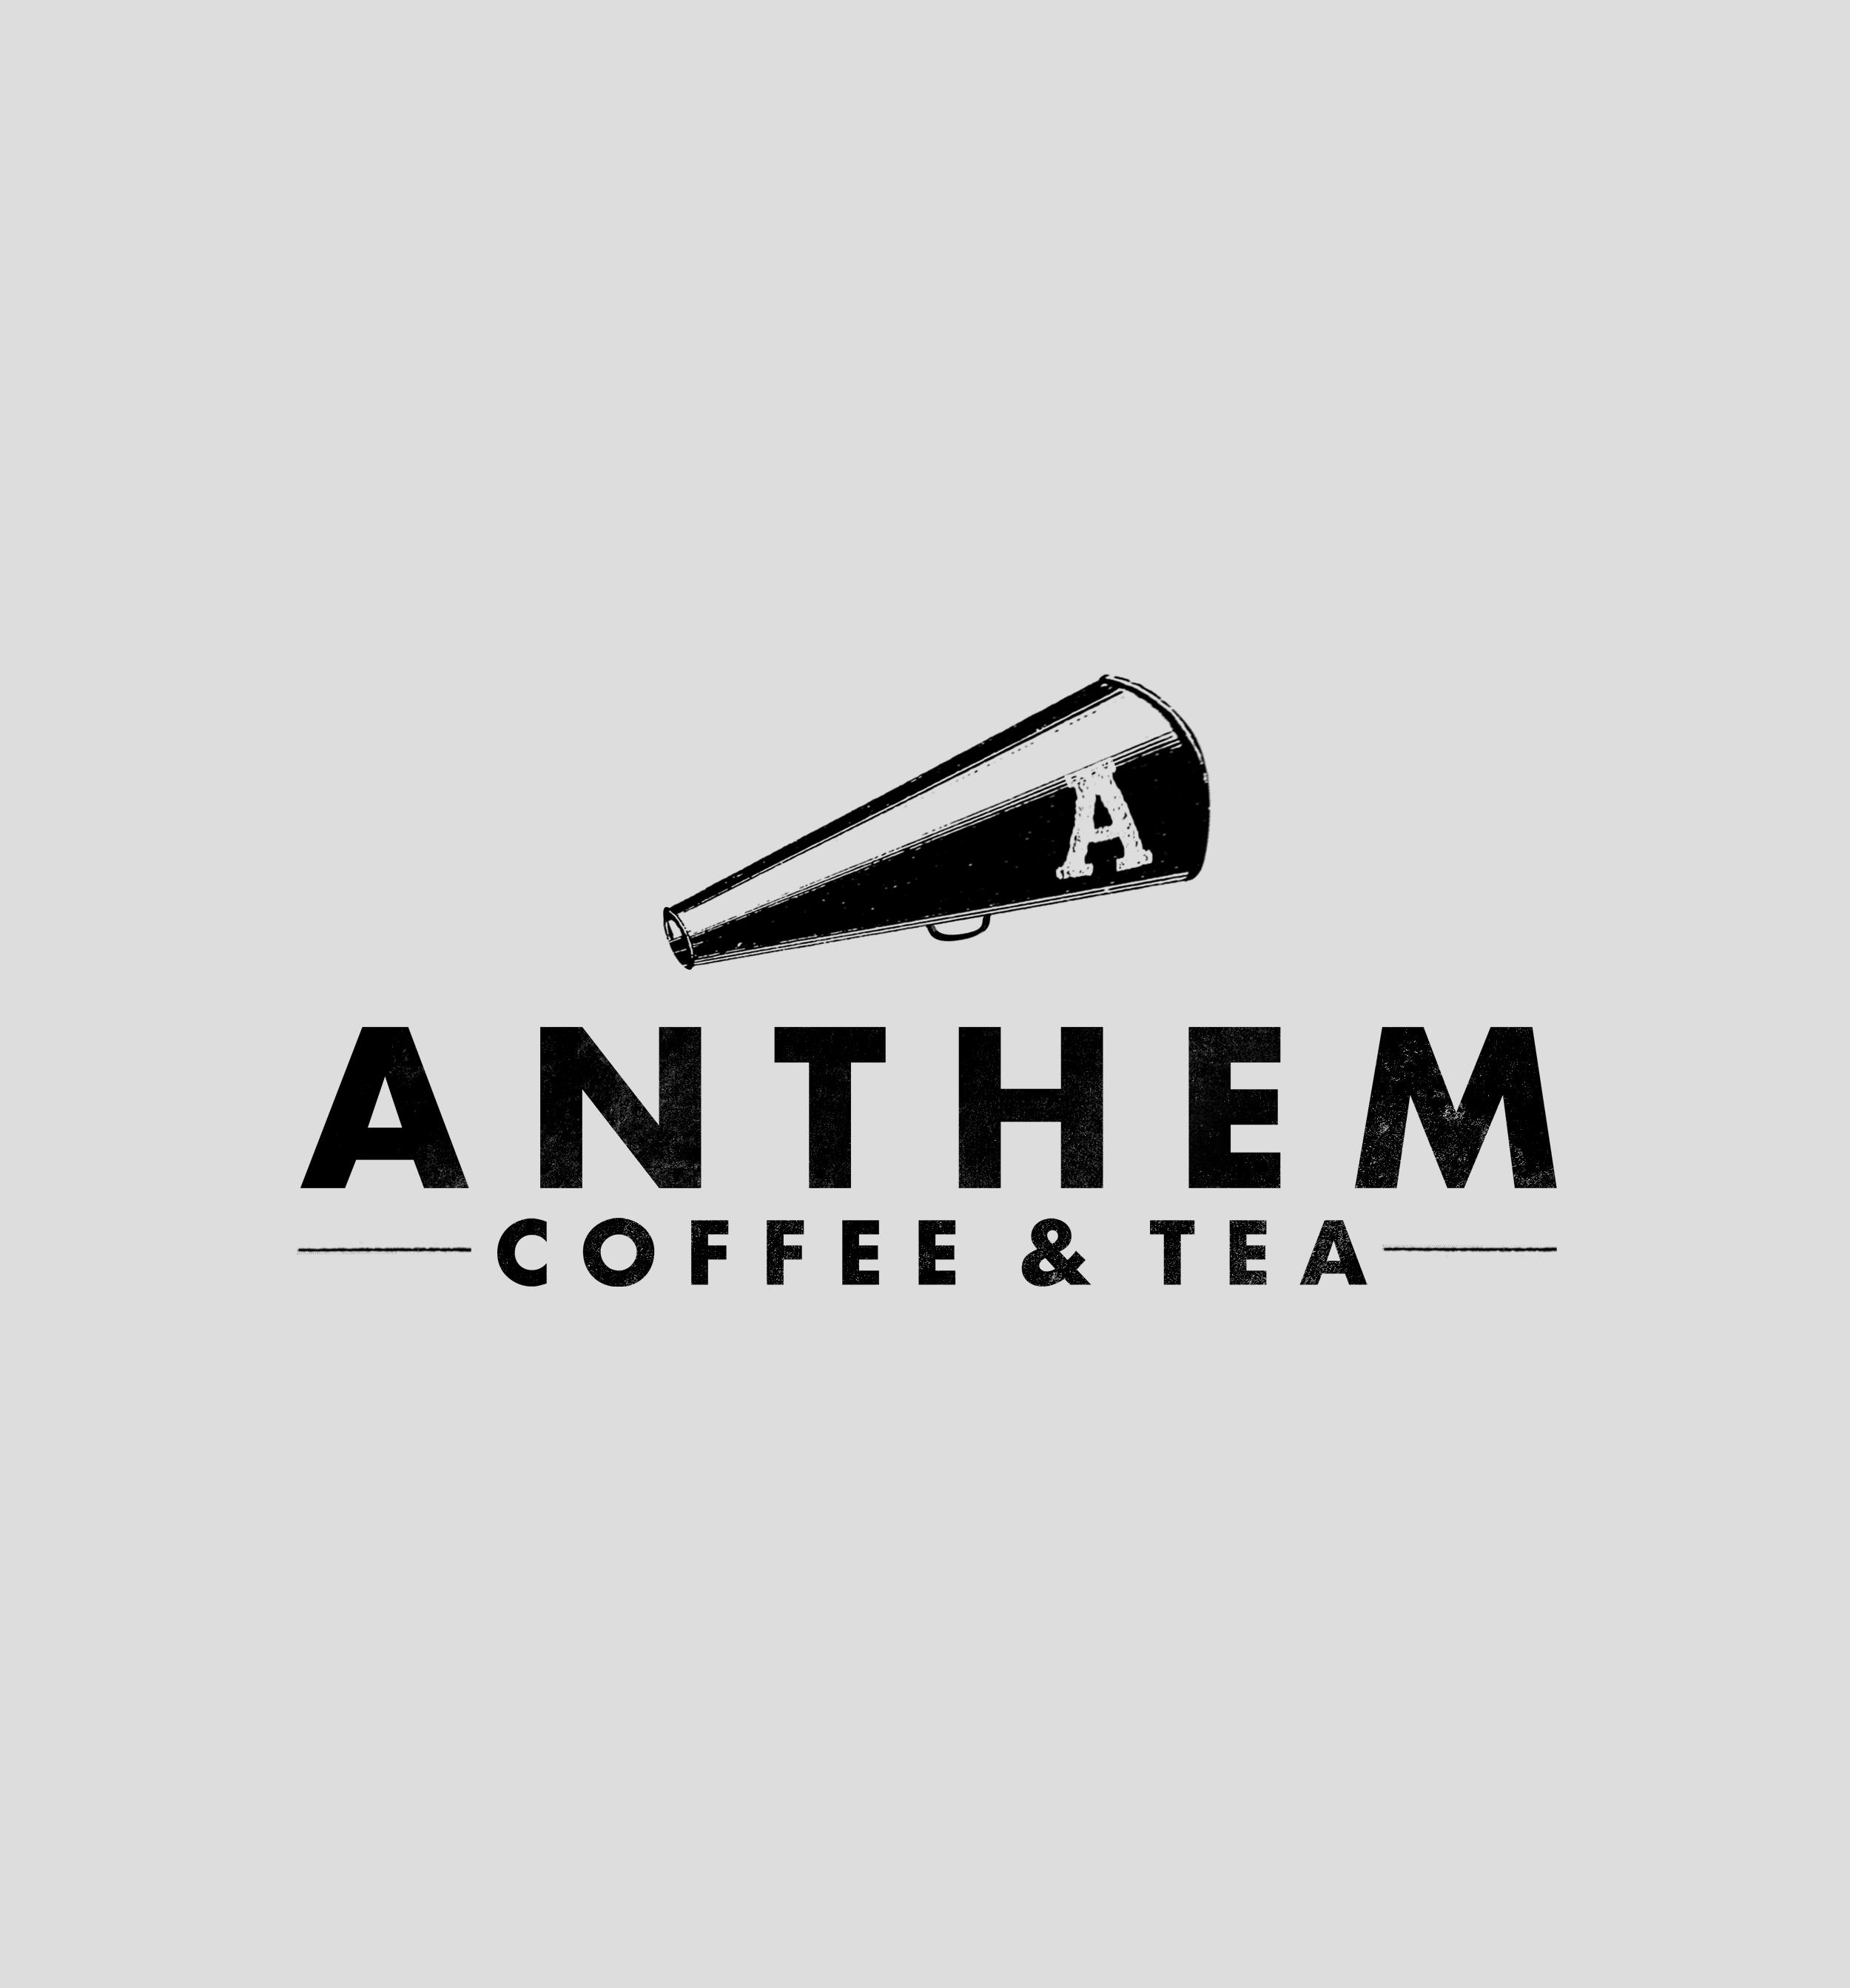 ANTHEM Coffee & Tea